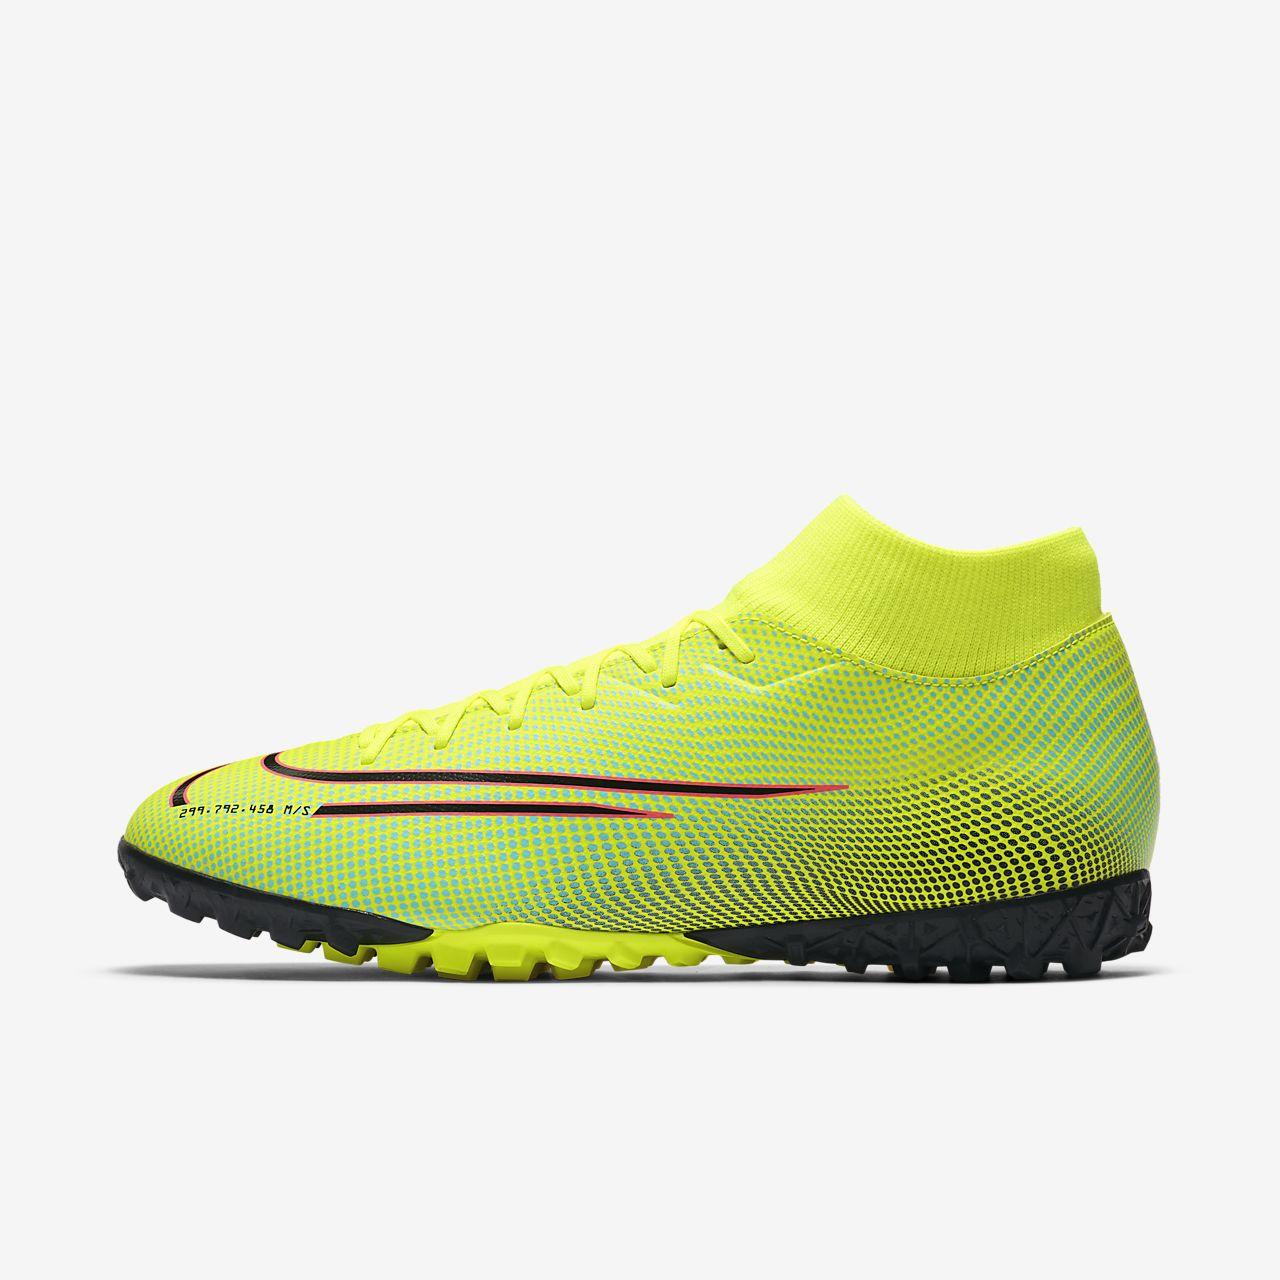 Nike Superfly 7 Academy MDS TF 男/女人造场地足球鞋